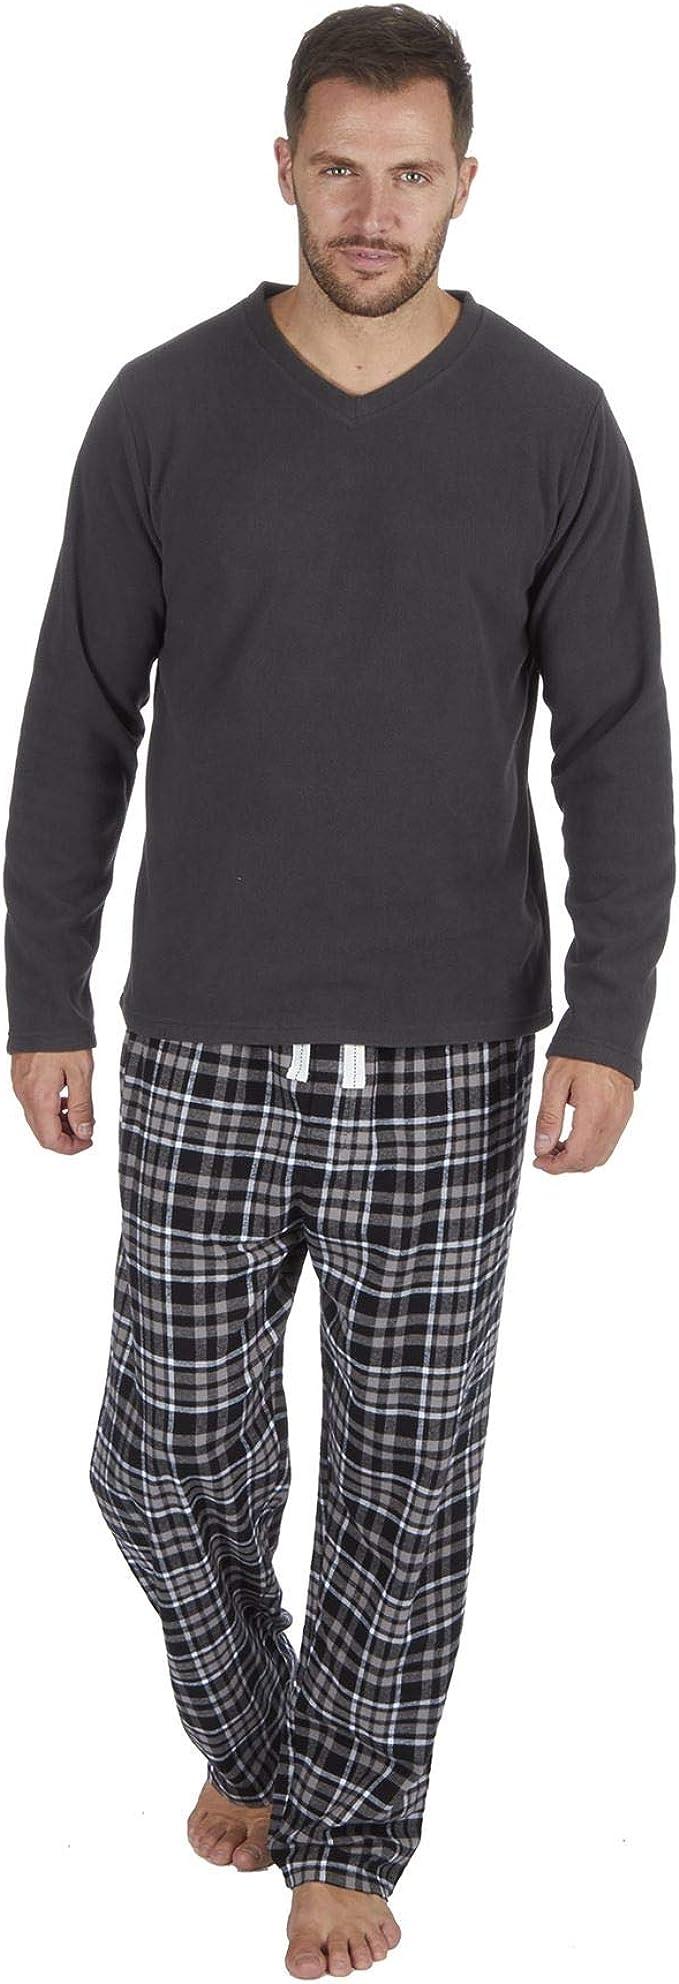 Mens Pyjamas Set Warm Long Check Bottoms Pjs Lounge Pajamas Fleece Winter pj